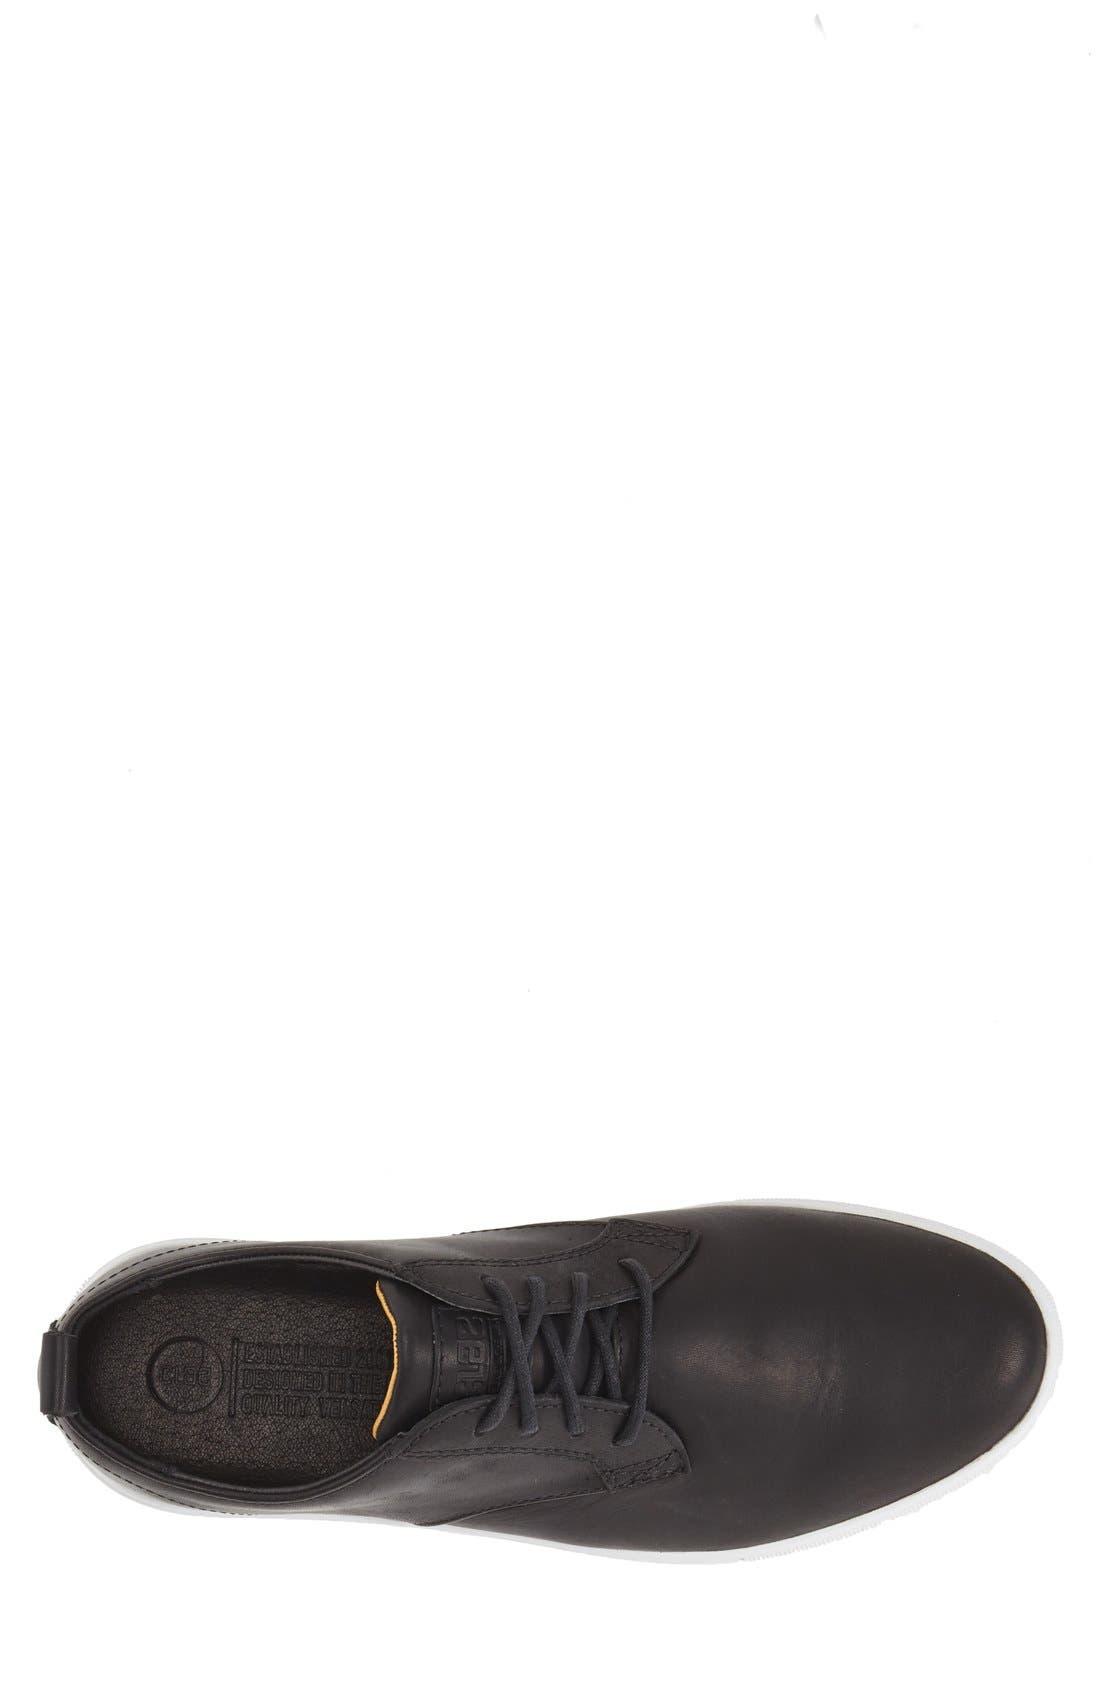 'Ellington' Sneaker,                             Alternate thumbnail 3, color,                             012